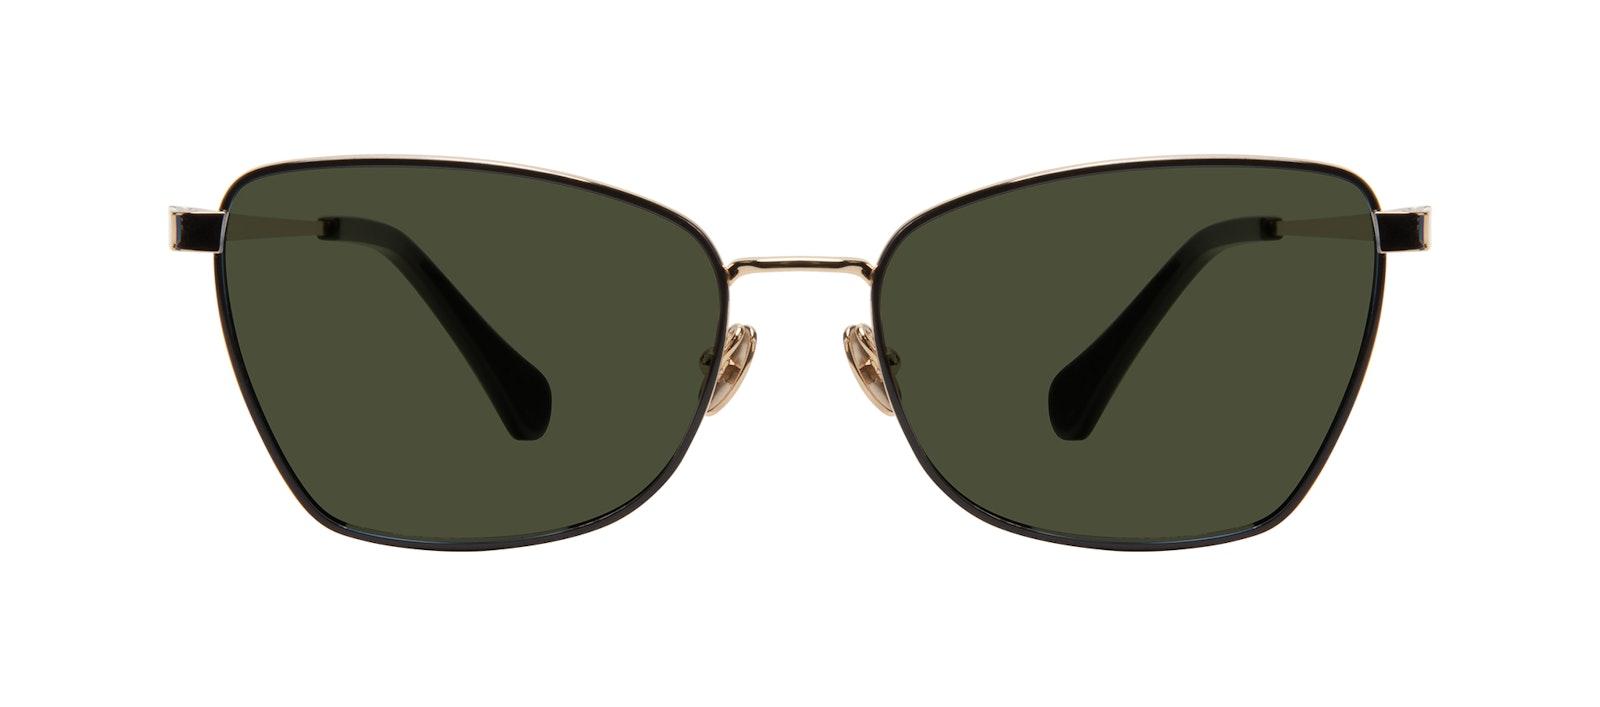 Affordable Fashion Glasses Cat Eye Sunglasses Women Fancy Deep Gold Front